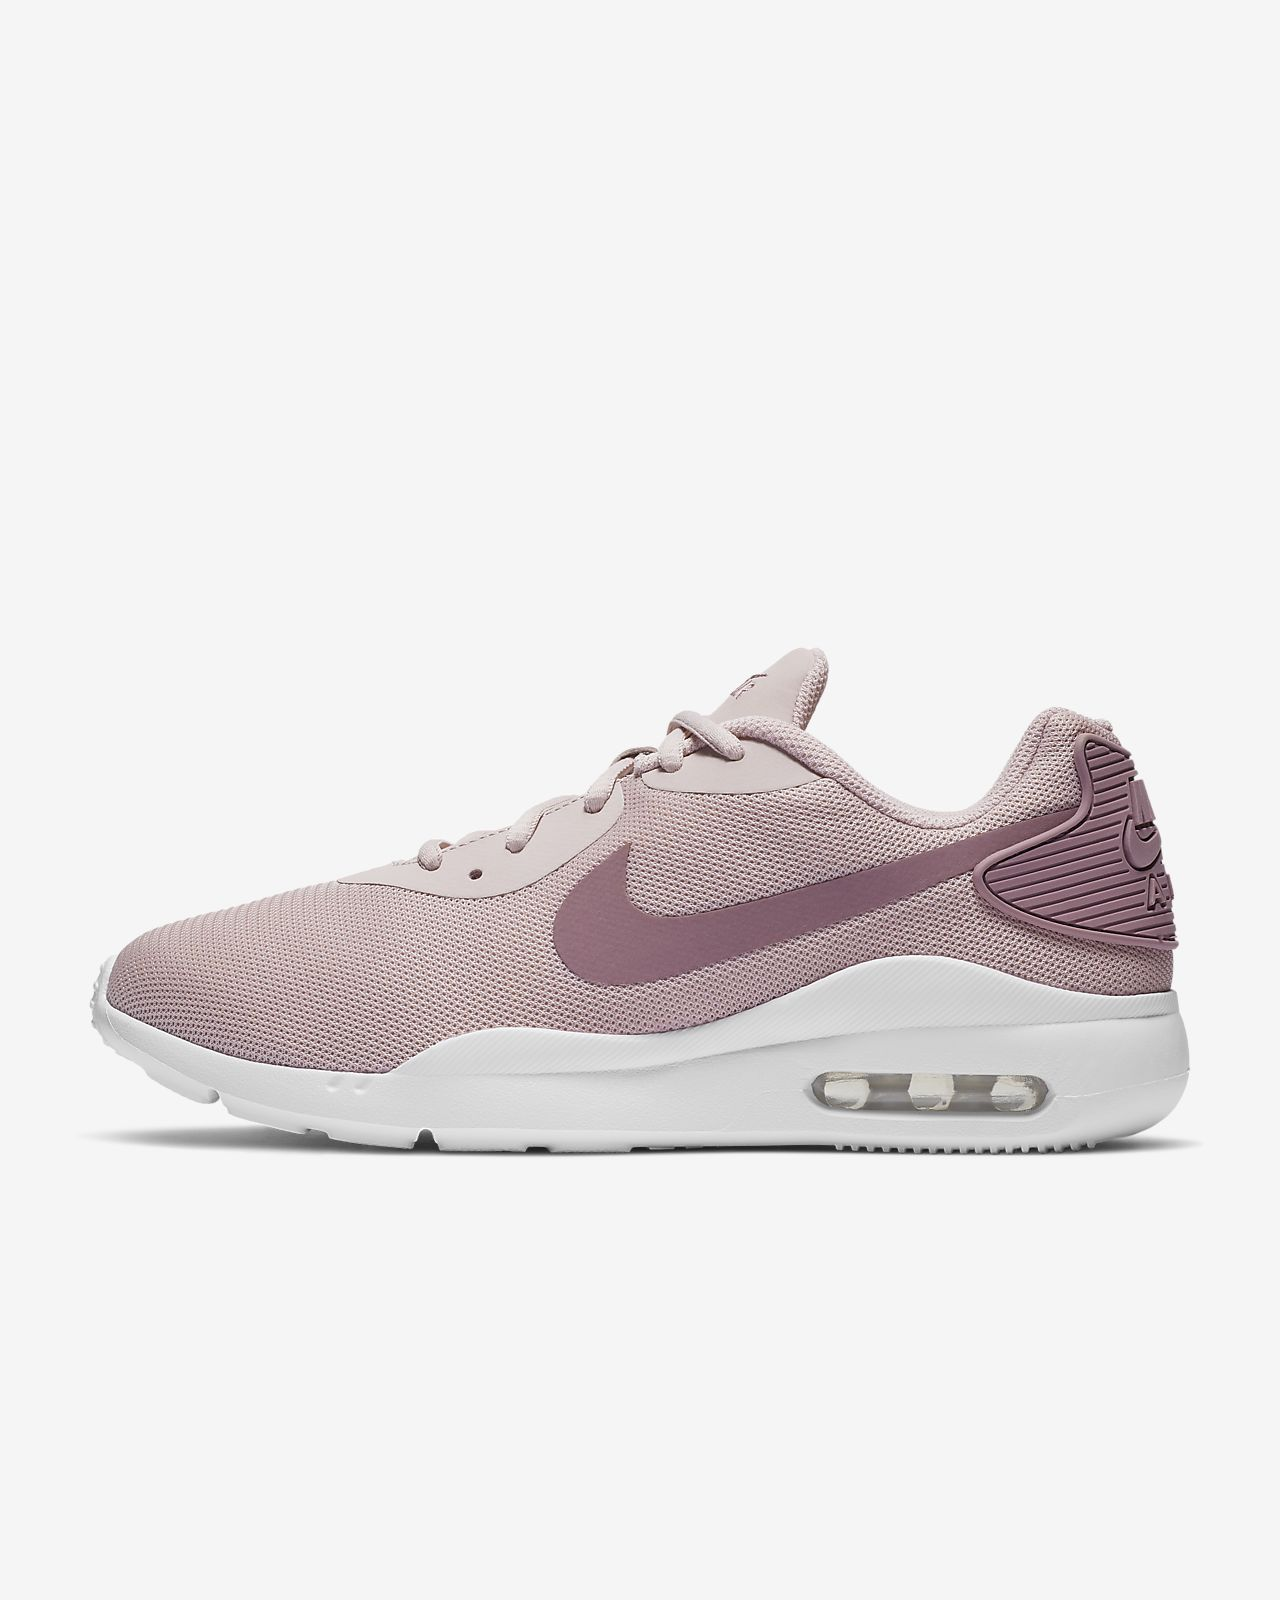 detailed look 85c36 d0a41 ... Nike Air Max Oketo Women s Shoe